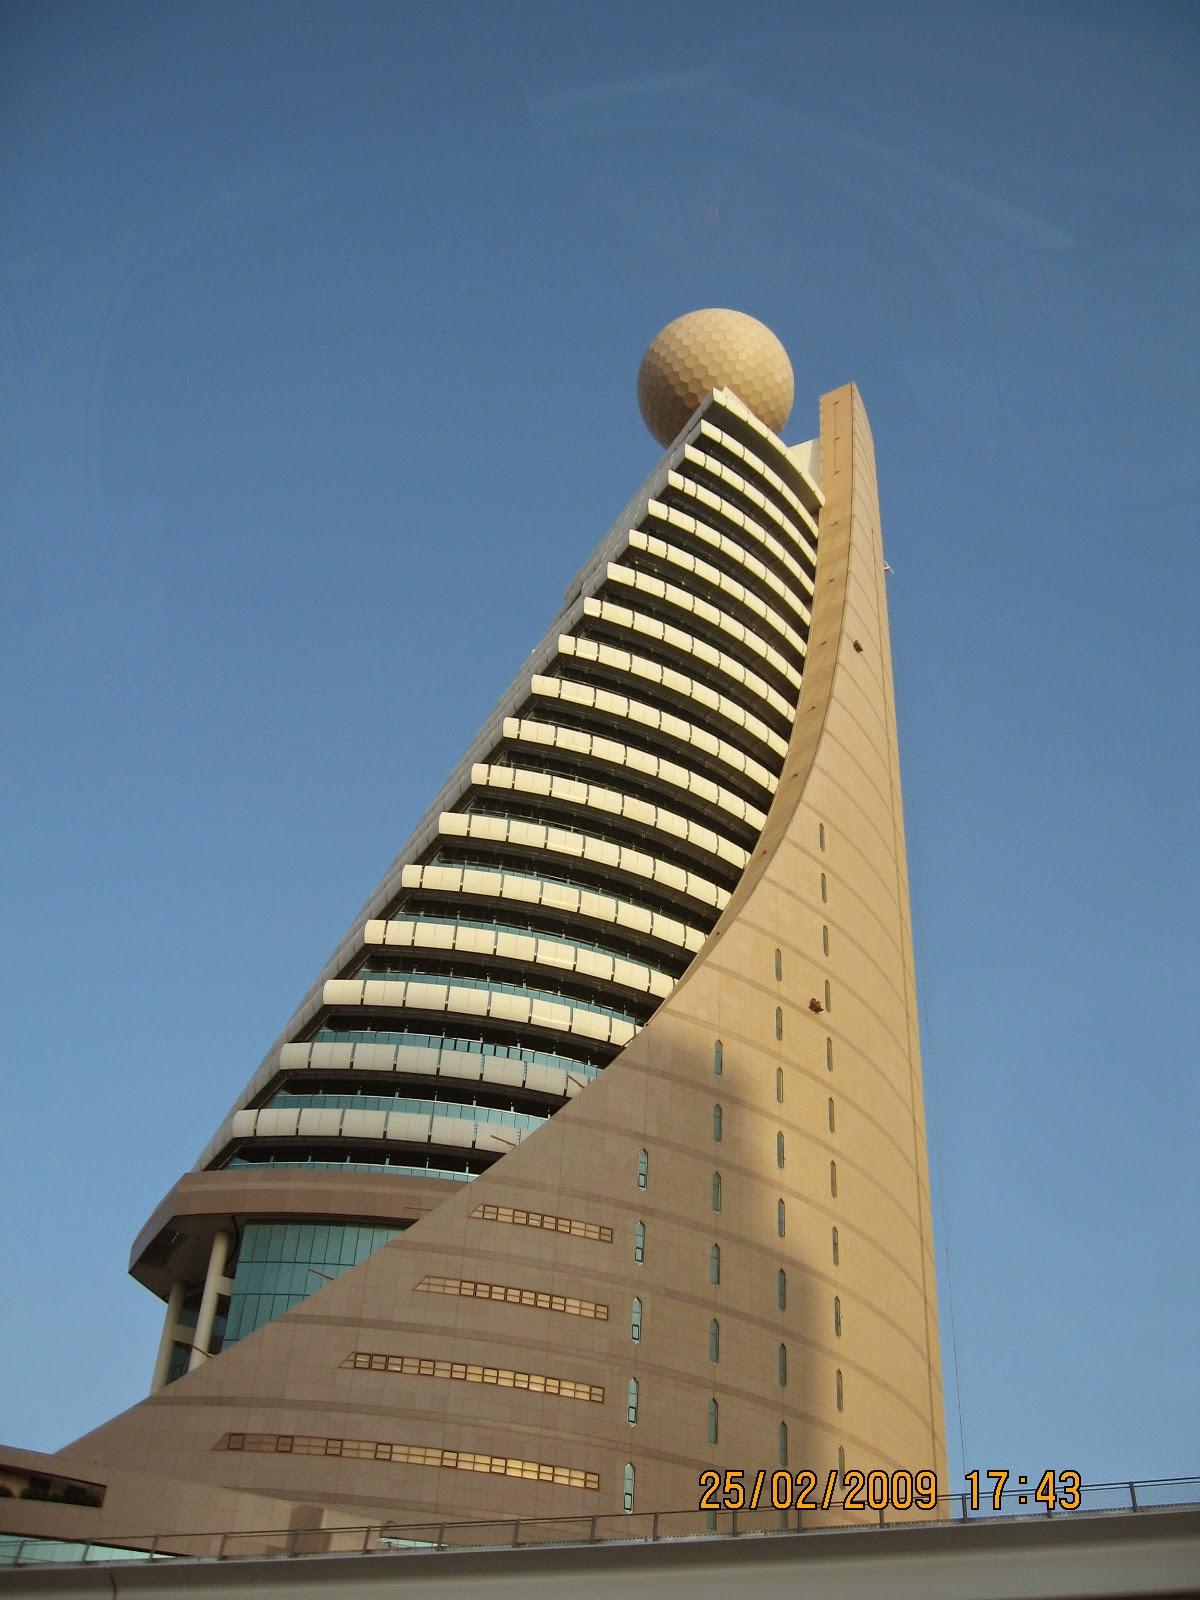 My personal email etisalat - Etisalat Tower 2 Sheikh Zayed Road Dubai